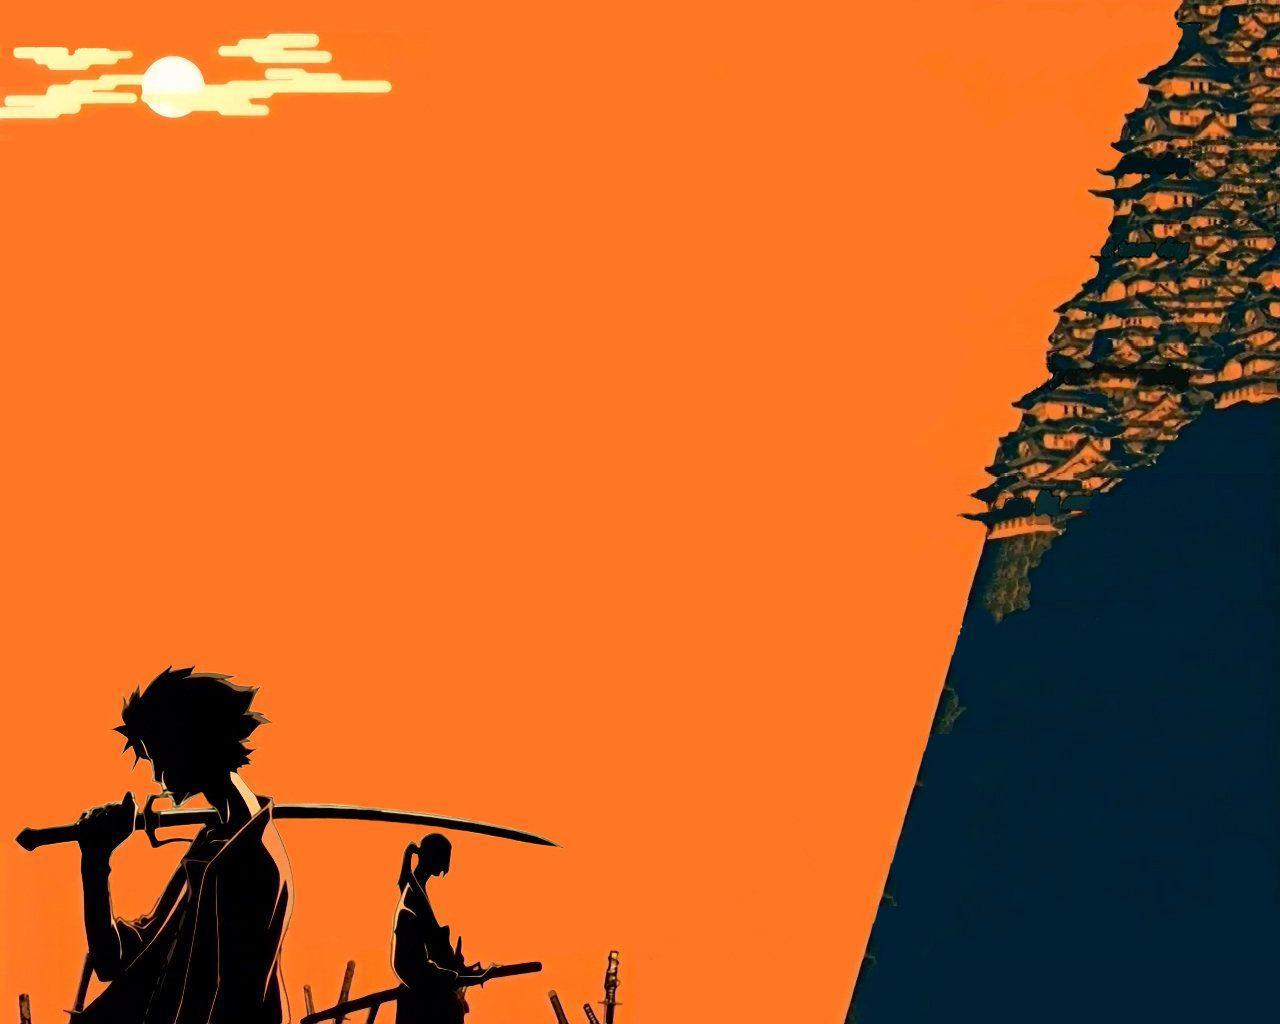 Samurai Champloo Opening Wallpapers Top Free Samurai Champloo Opening Backgrounds Wallpaperaccess